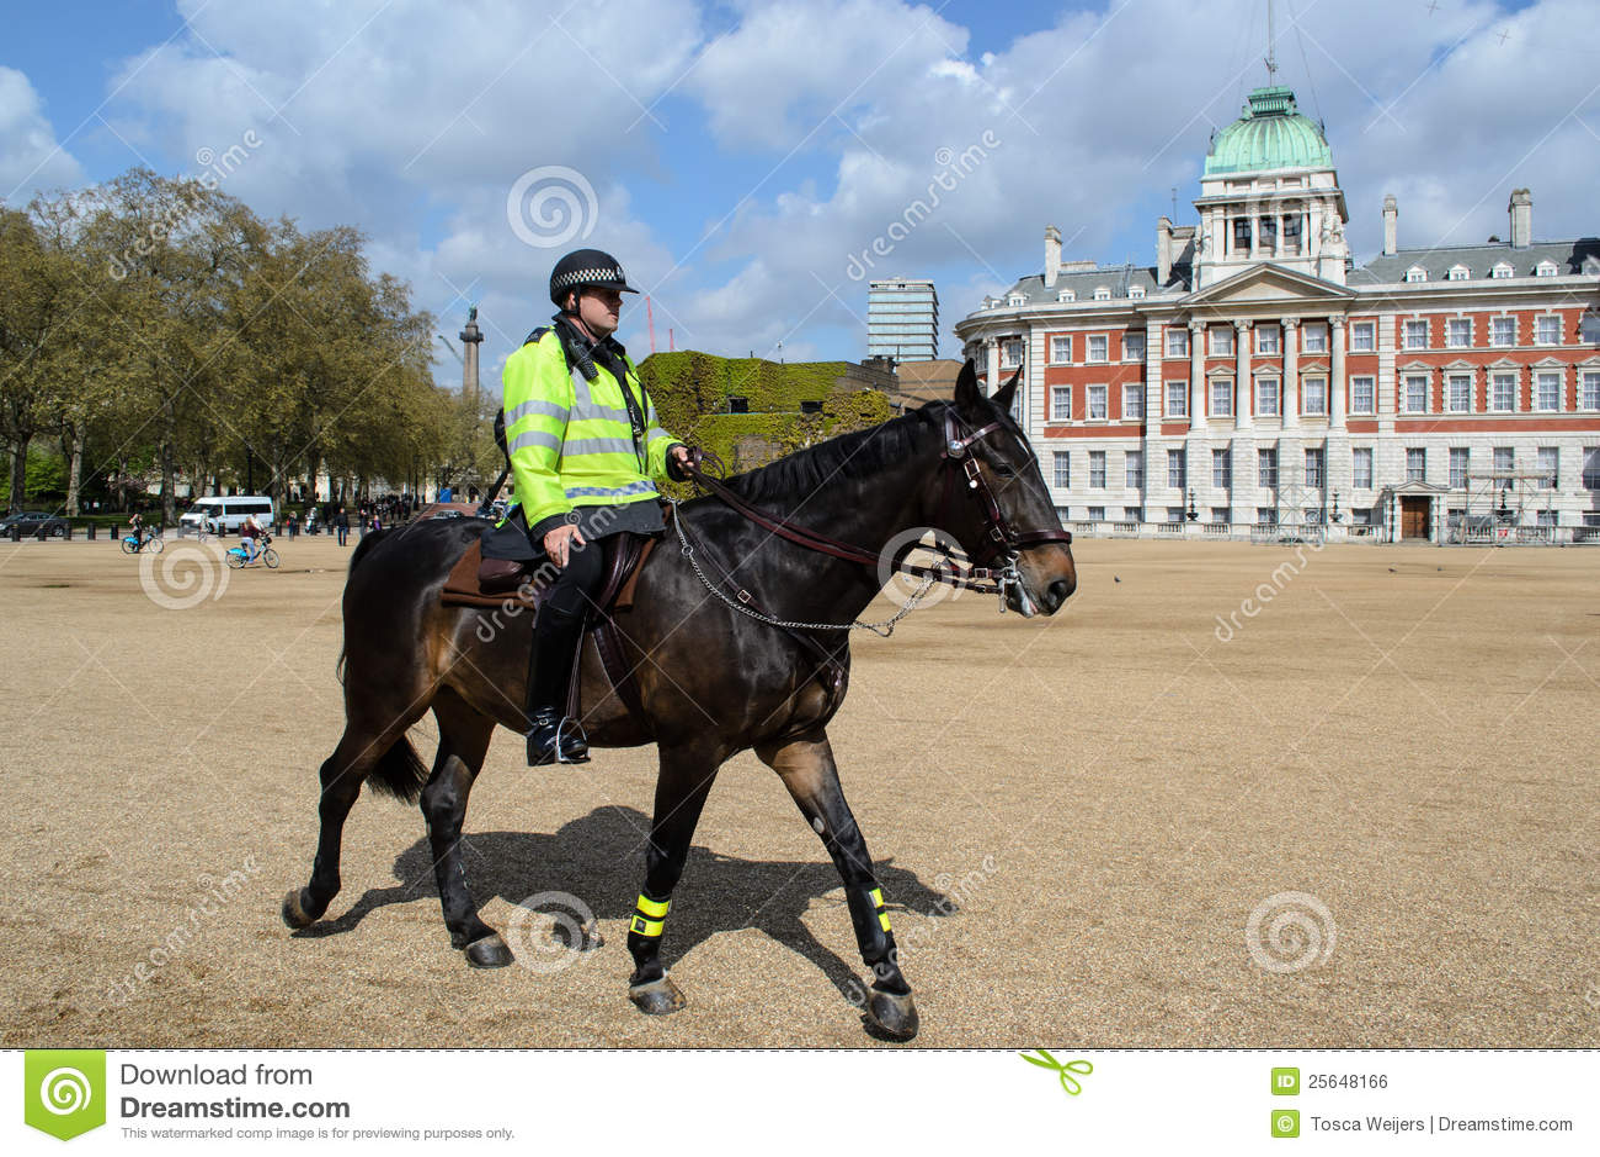 Policier britannique à cheval